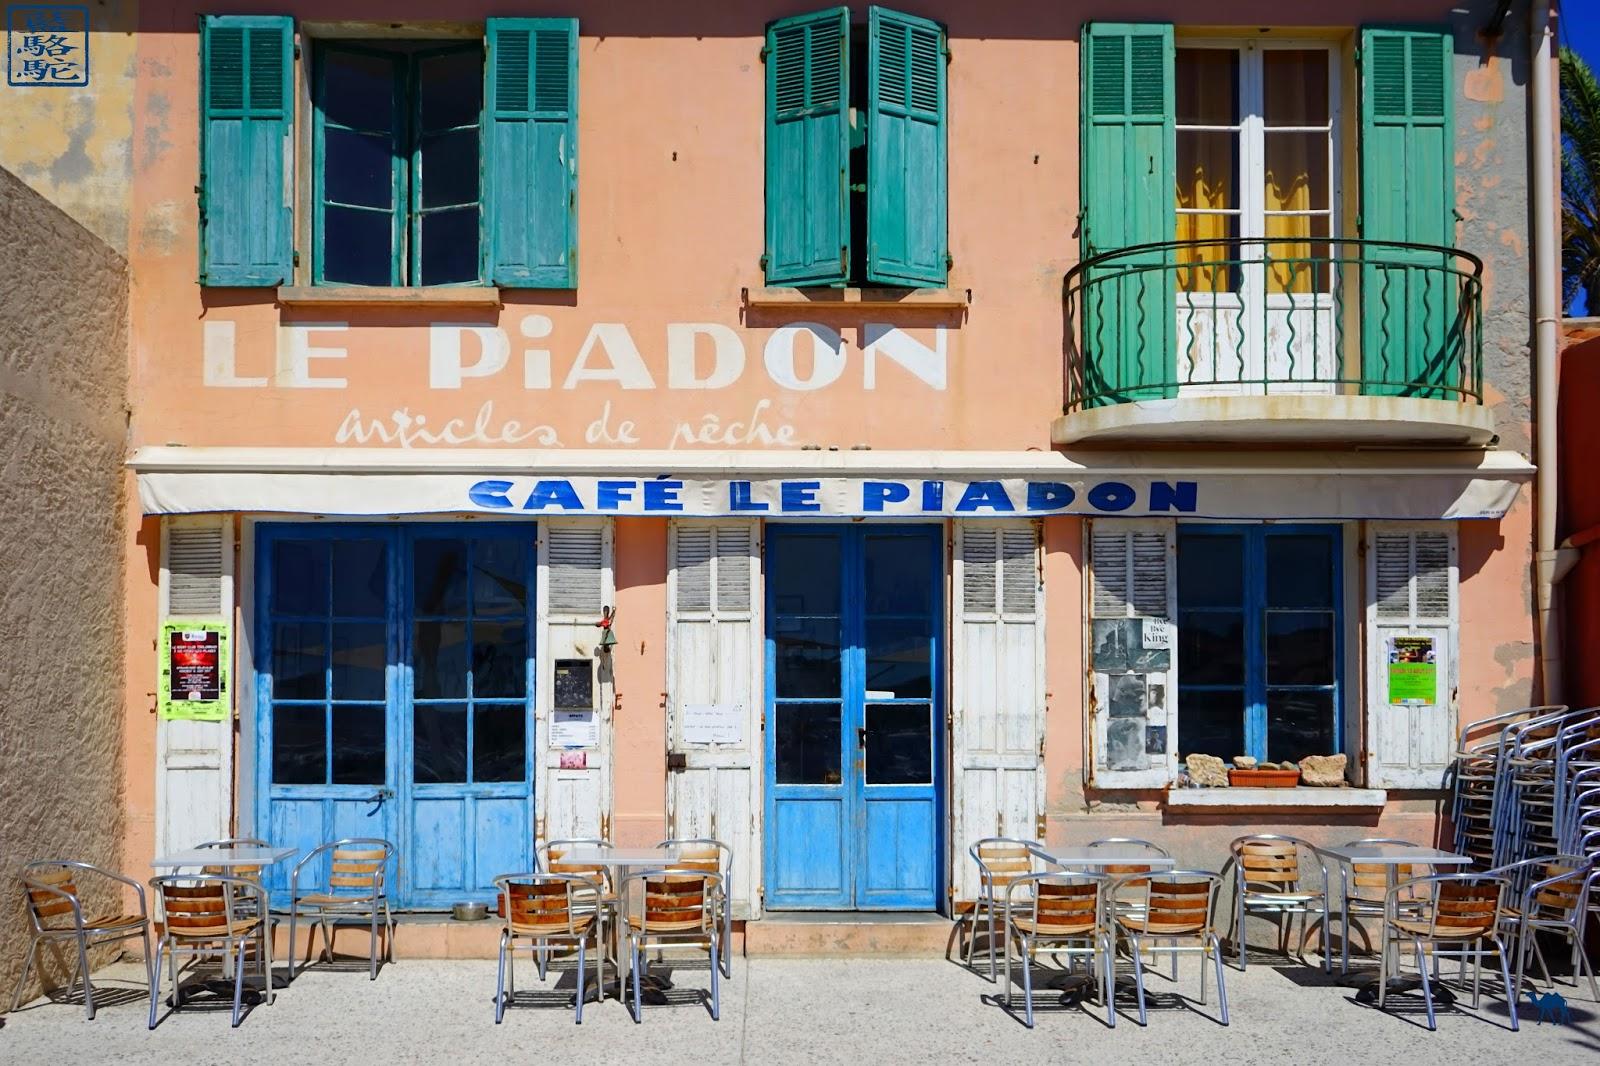 Le Chameau Bleu - Blog Voyage Var Brusc - Port du Brusc - Le Piadon - Var